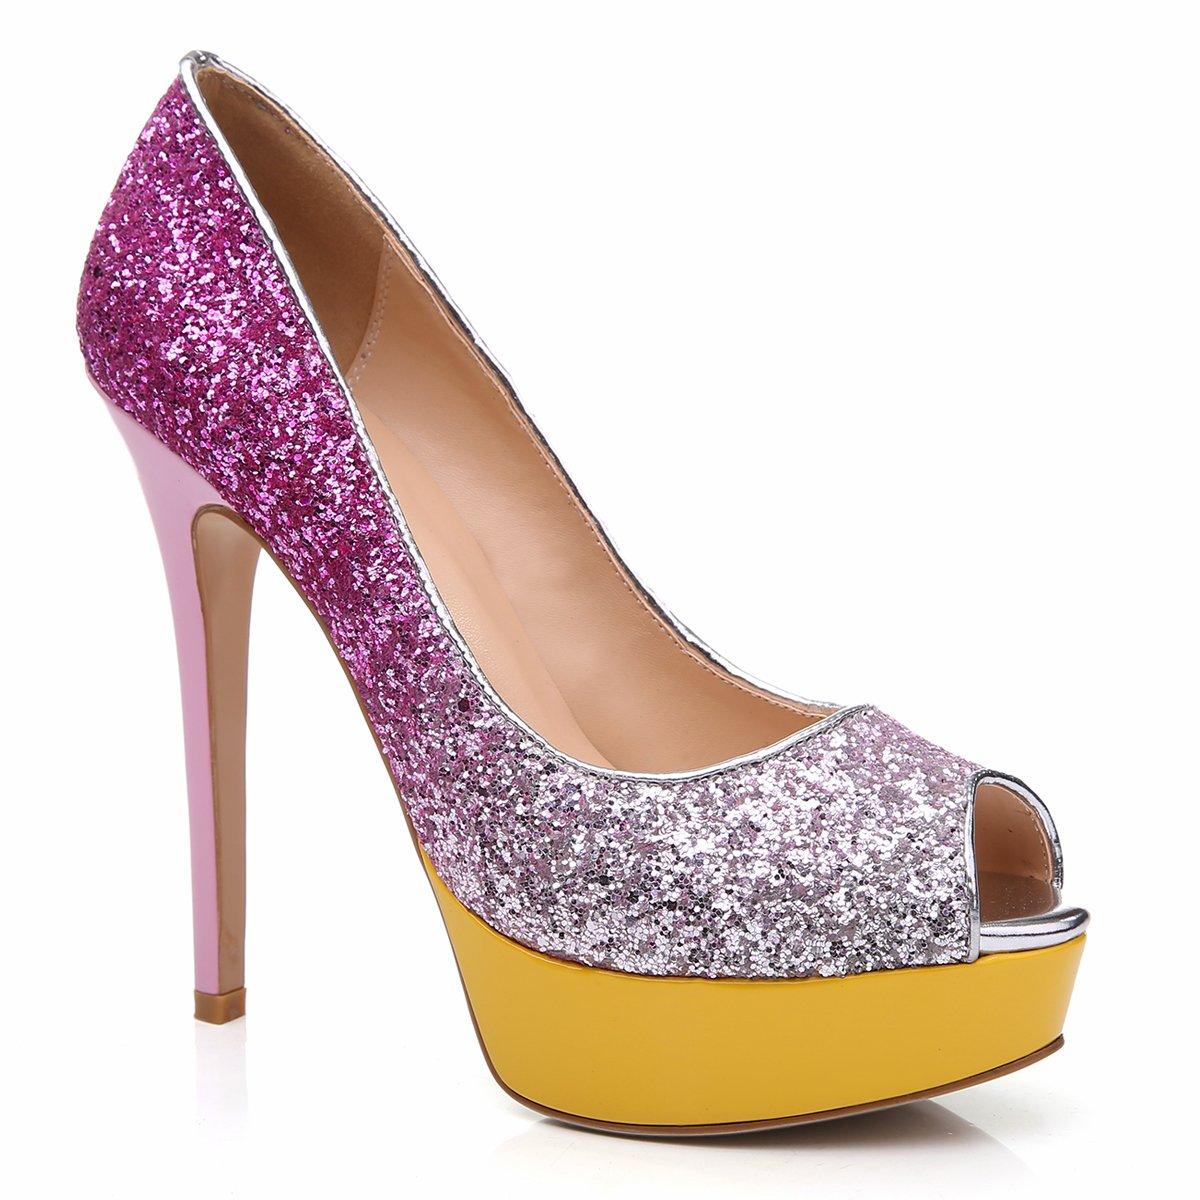 Onlymaker Peep Damens's Extreme High Fashion Peep Onlymaker Toe Pumps Handmade For Wedding Party Dress Stiletto Slip On Schuhes glitzer rosa f96c5d